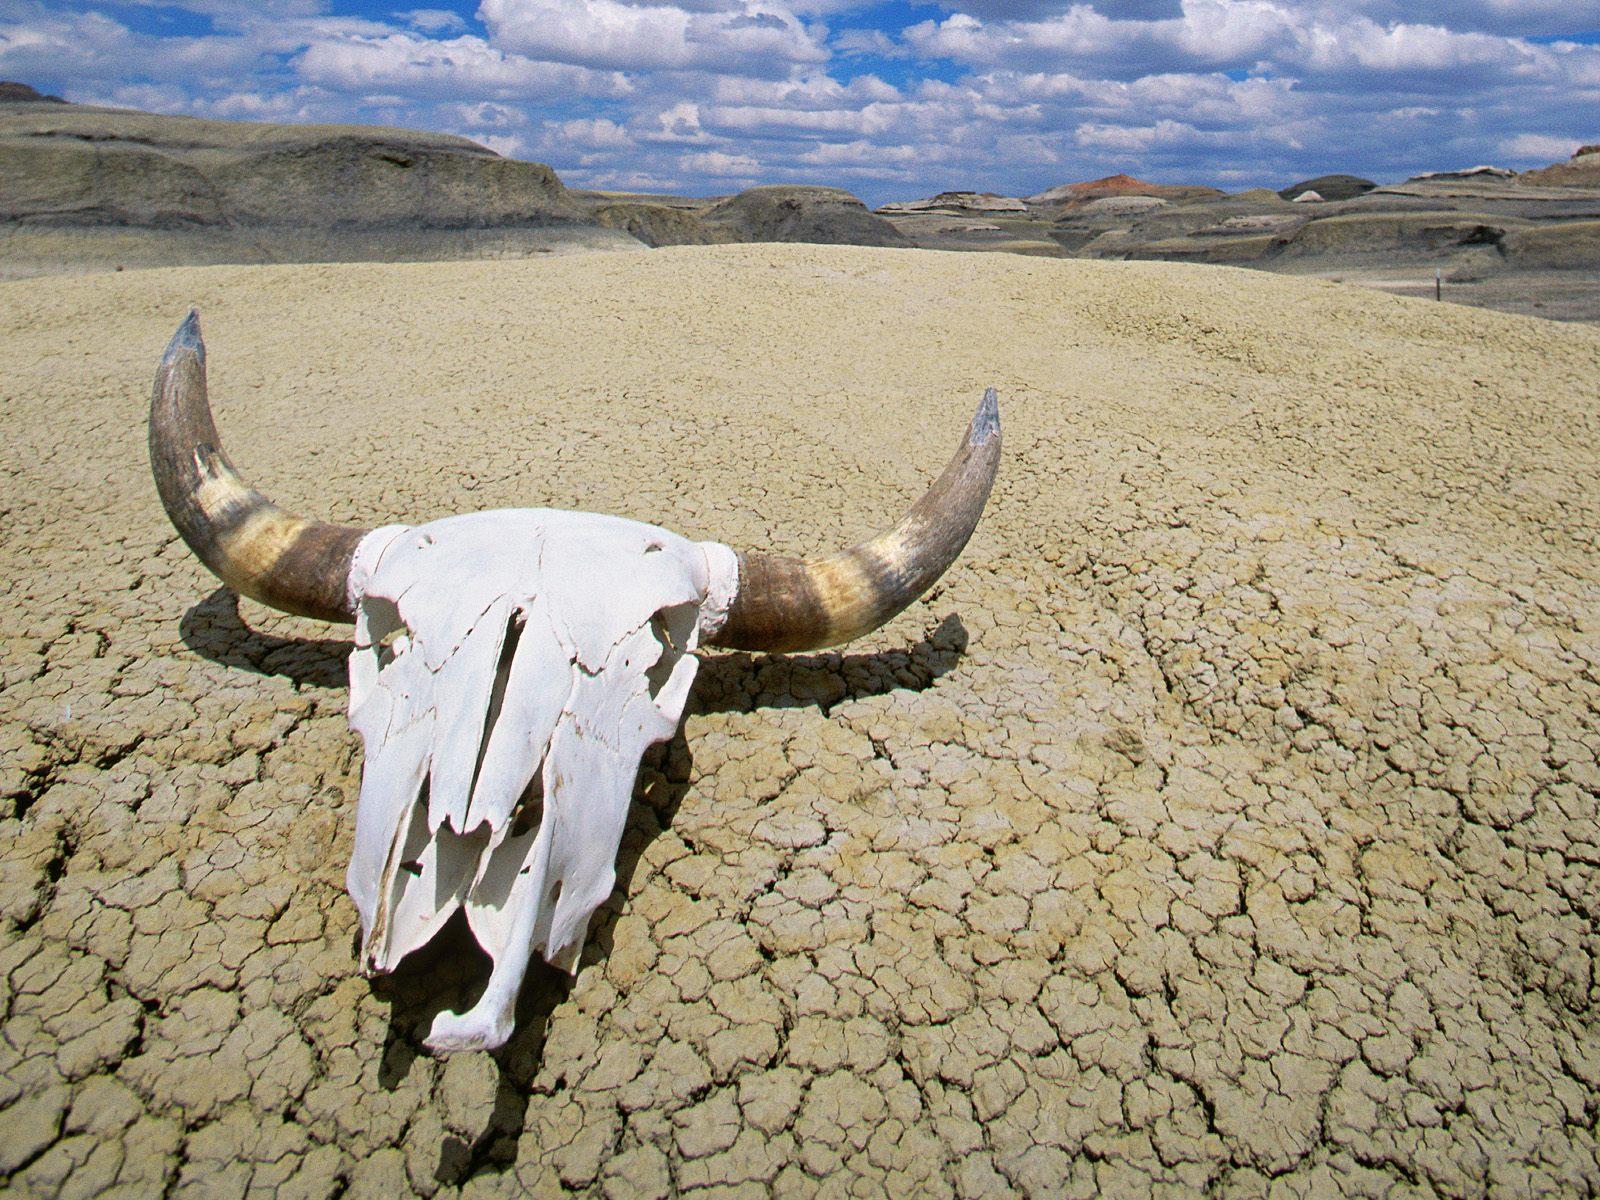 High Resolution Wallpaper | Death Valley 1600x1200 px